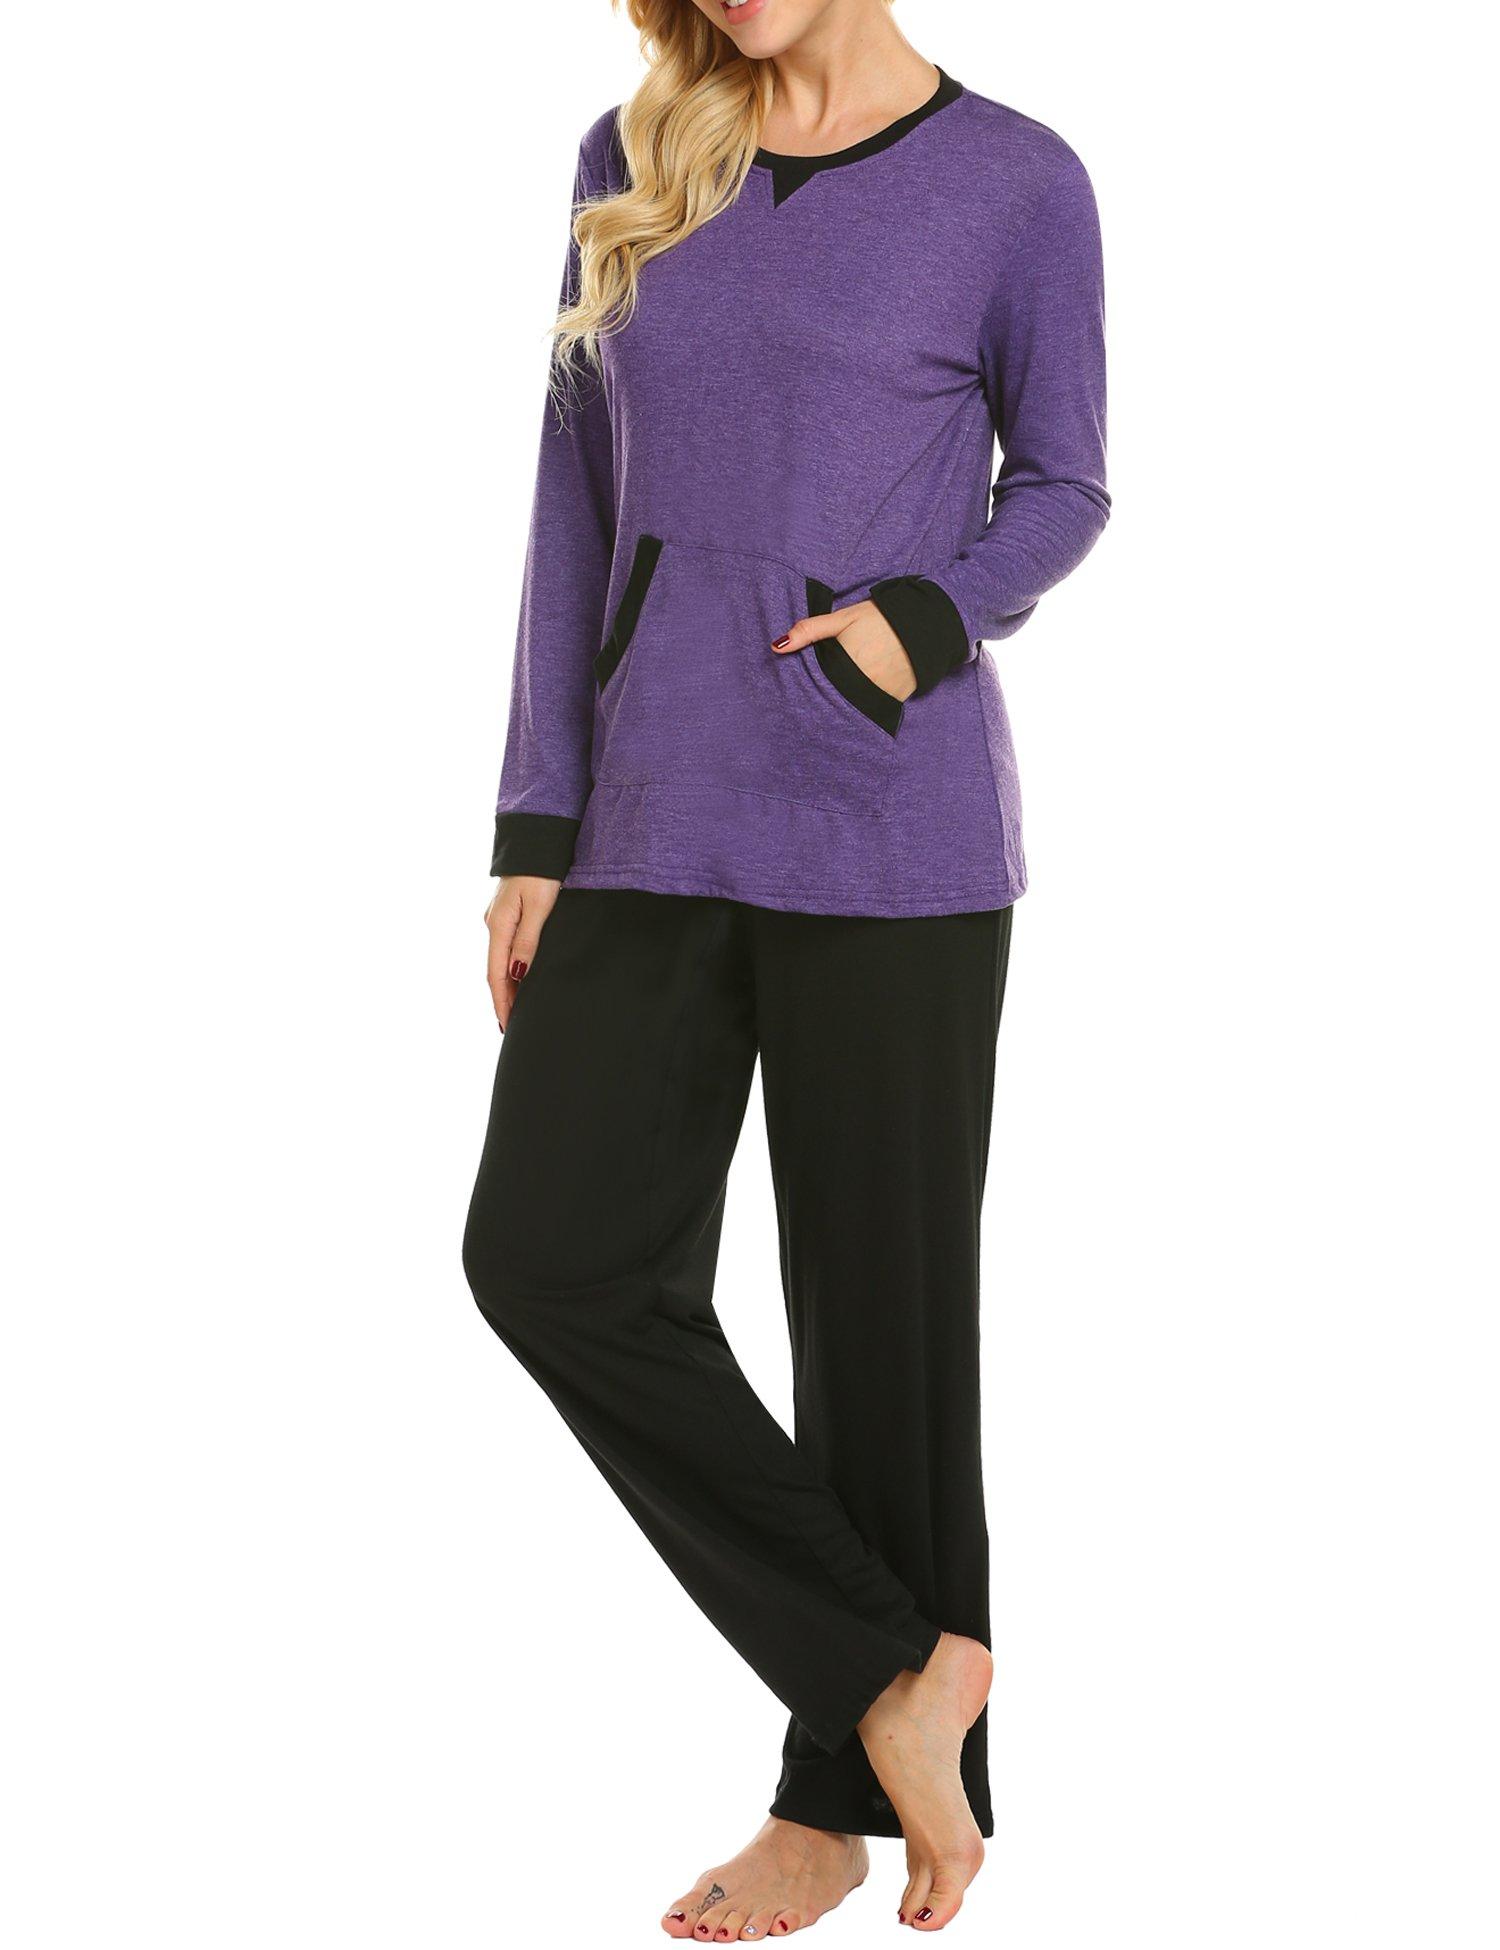 MAXMODA Soft Pajamas Long Sleeve Sleepwear Soft PJ Set with Pants Purple L by MAXMODA (Image #5)